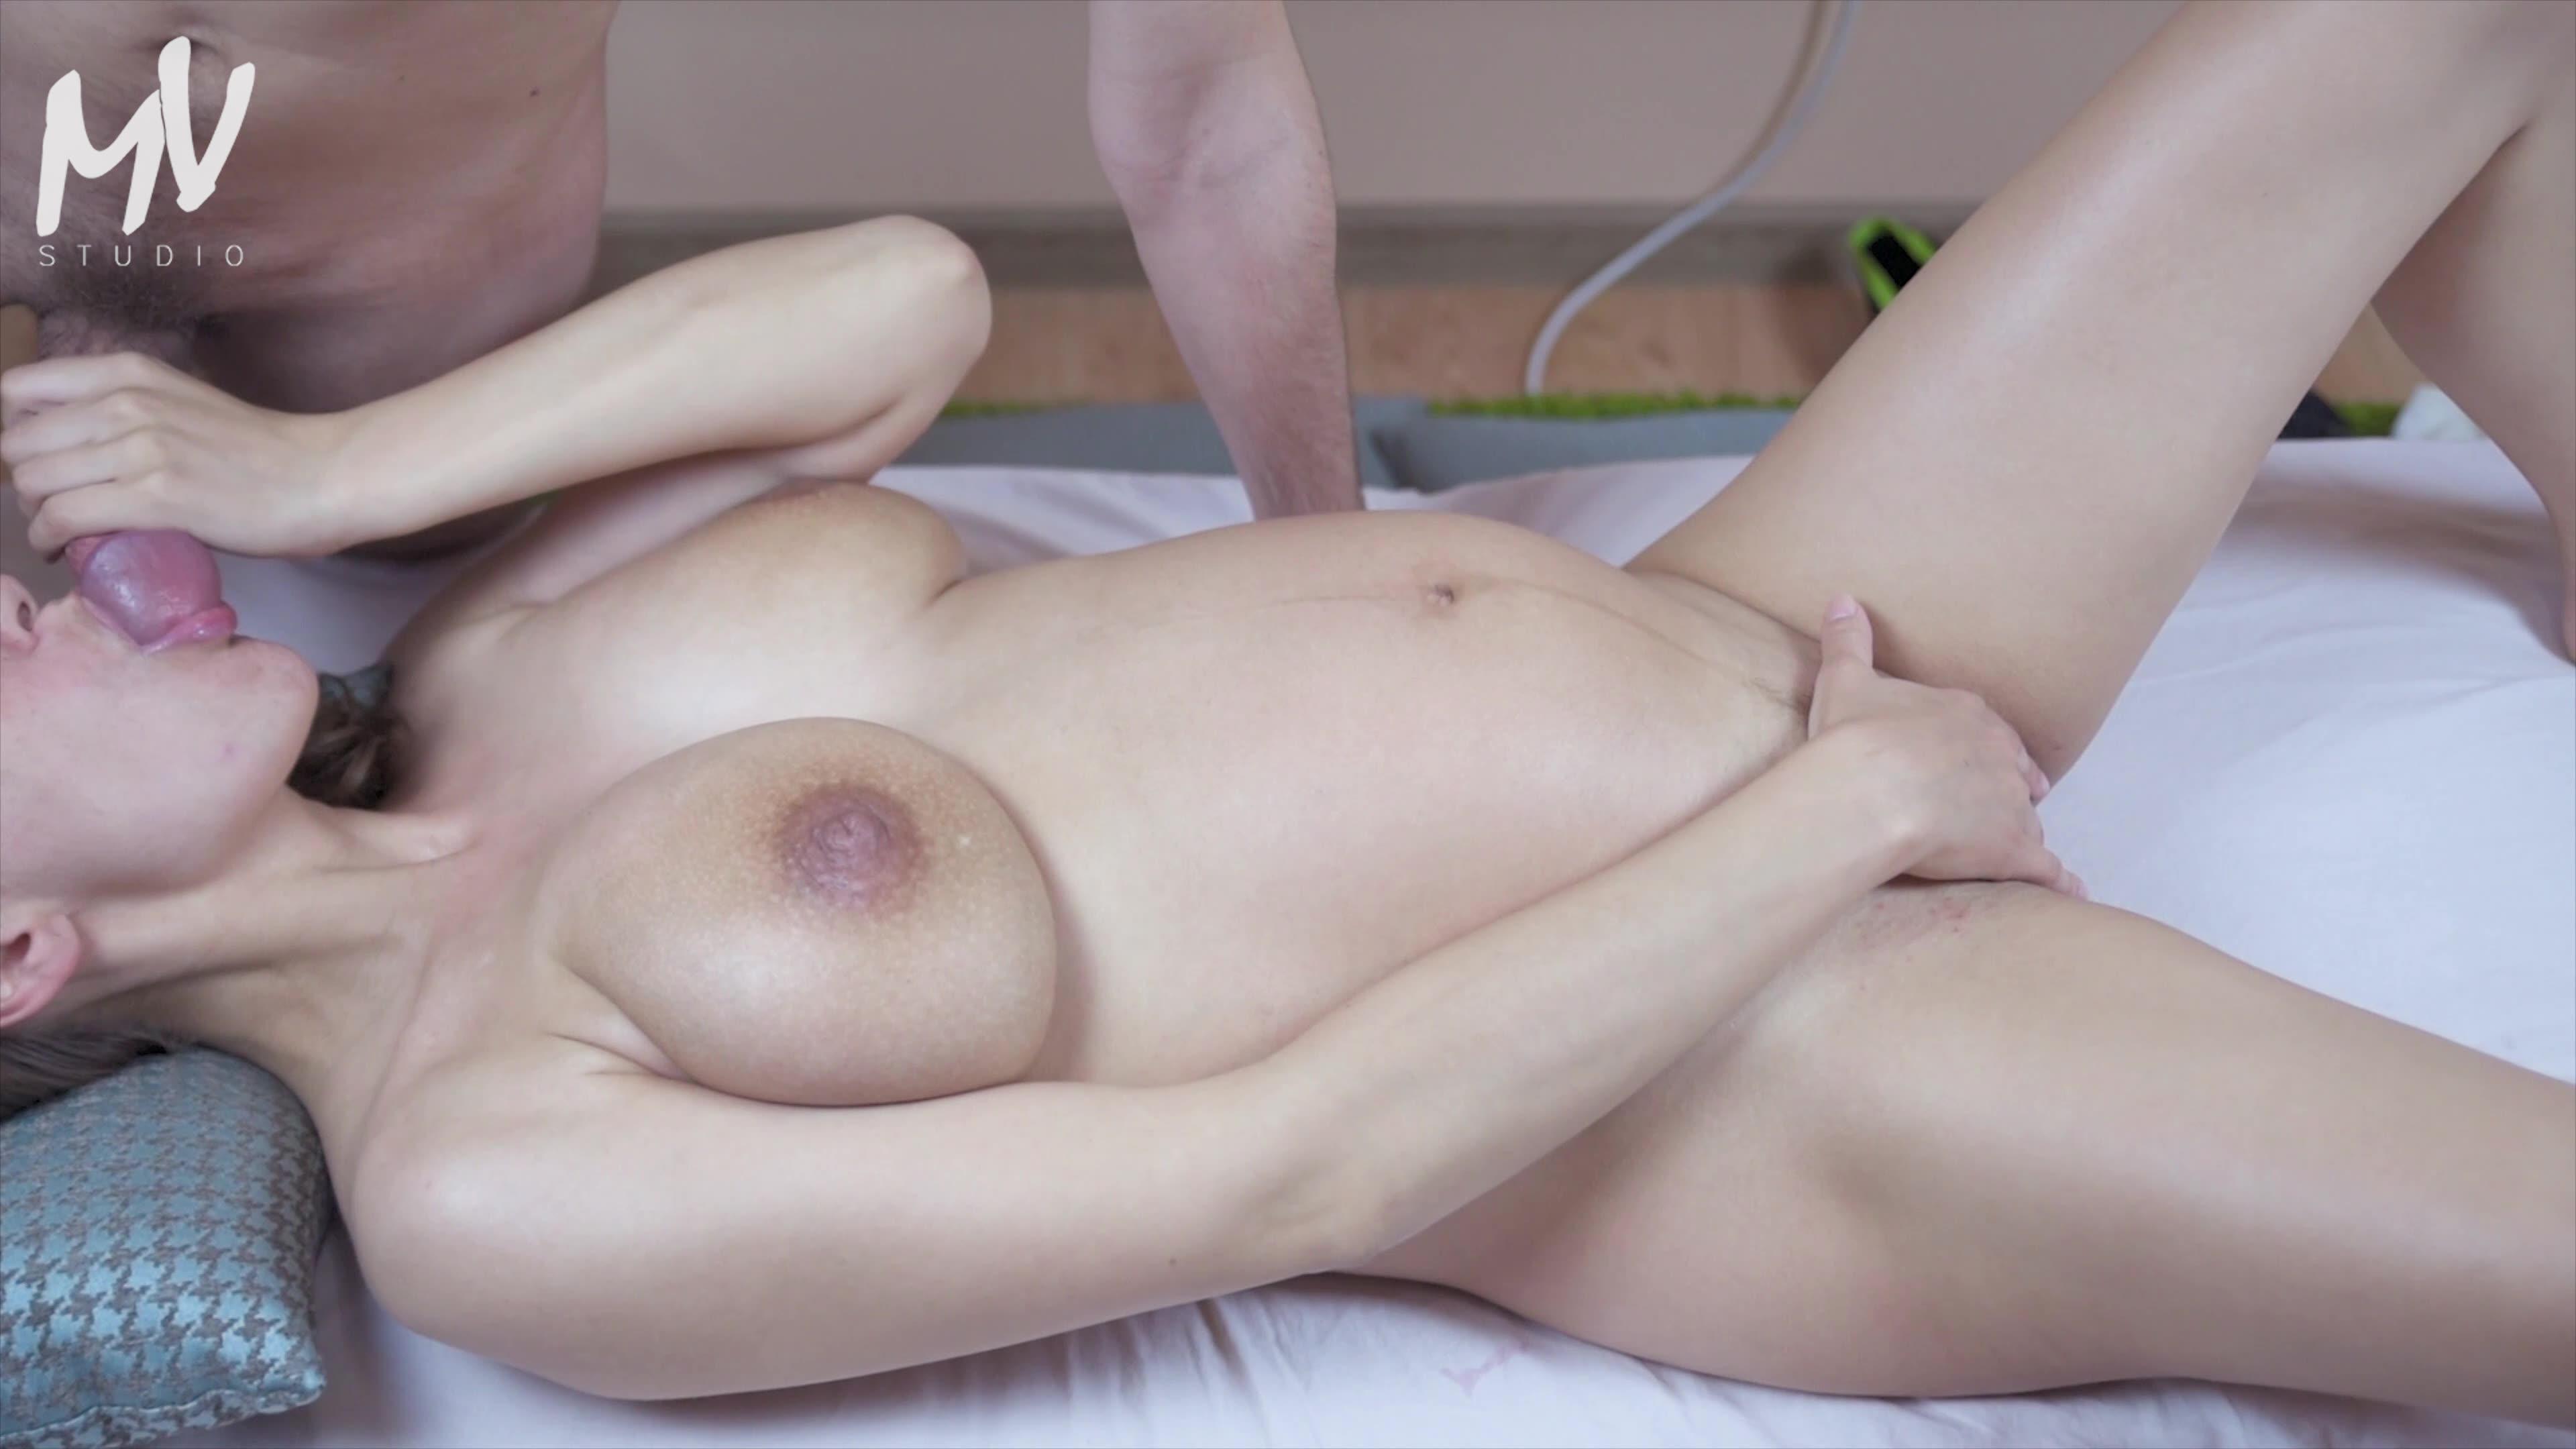 Czechav Pregnant Fucking In Massage Roon Free Sex Pics